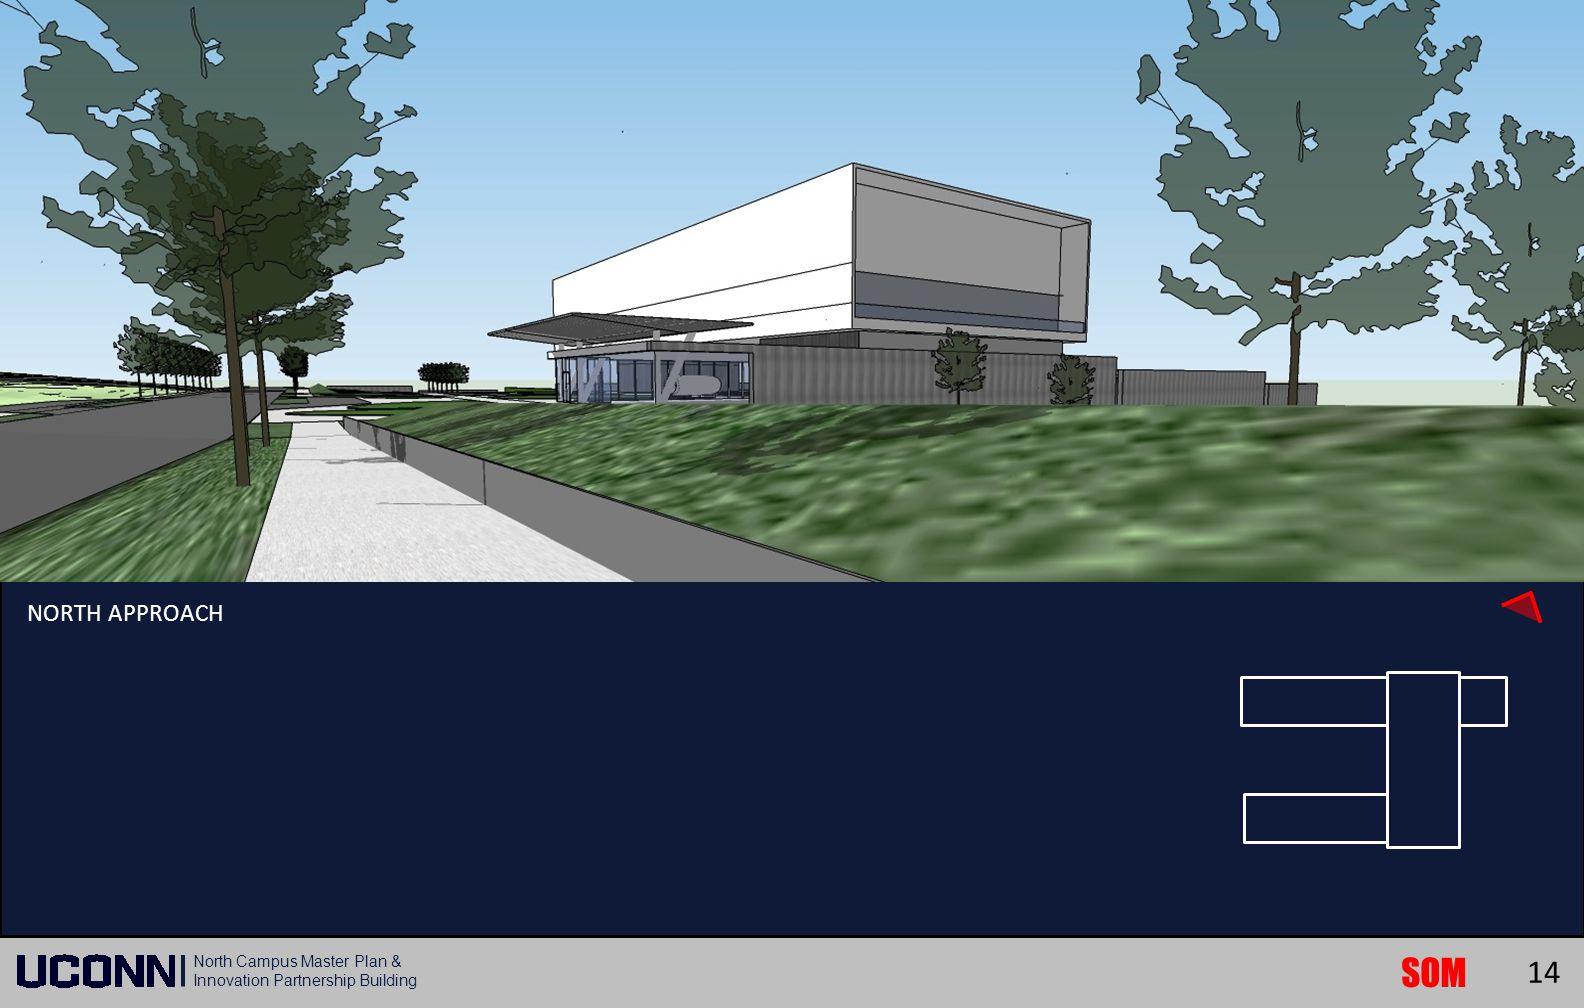 SOM North Campus Master Plan & Innovation Partnership Building NORTH APPROACH 14